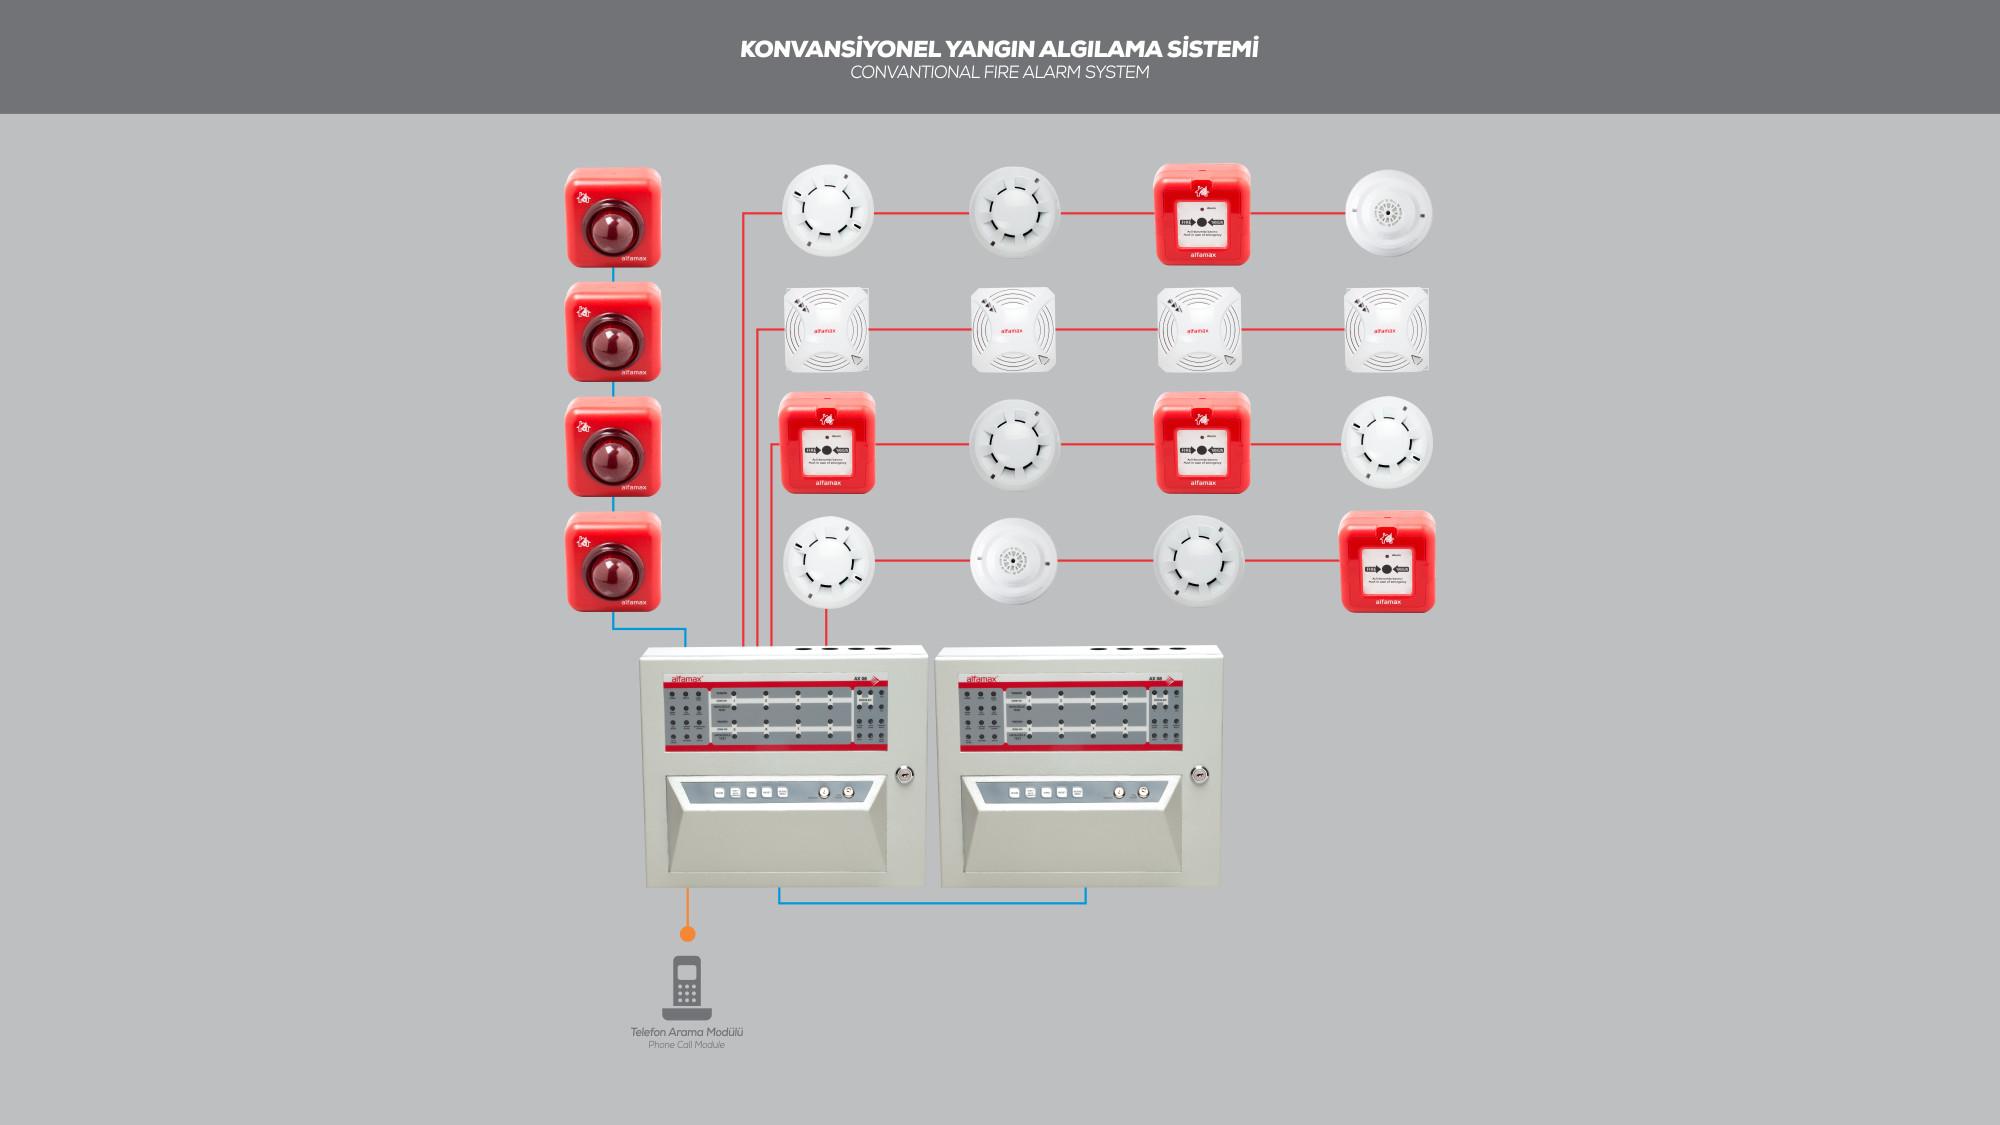 TeknikSema_KonvansiyonelYanginAlgılamaSistemi